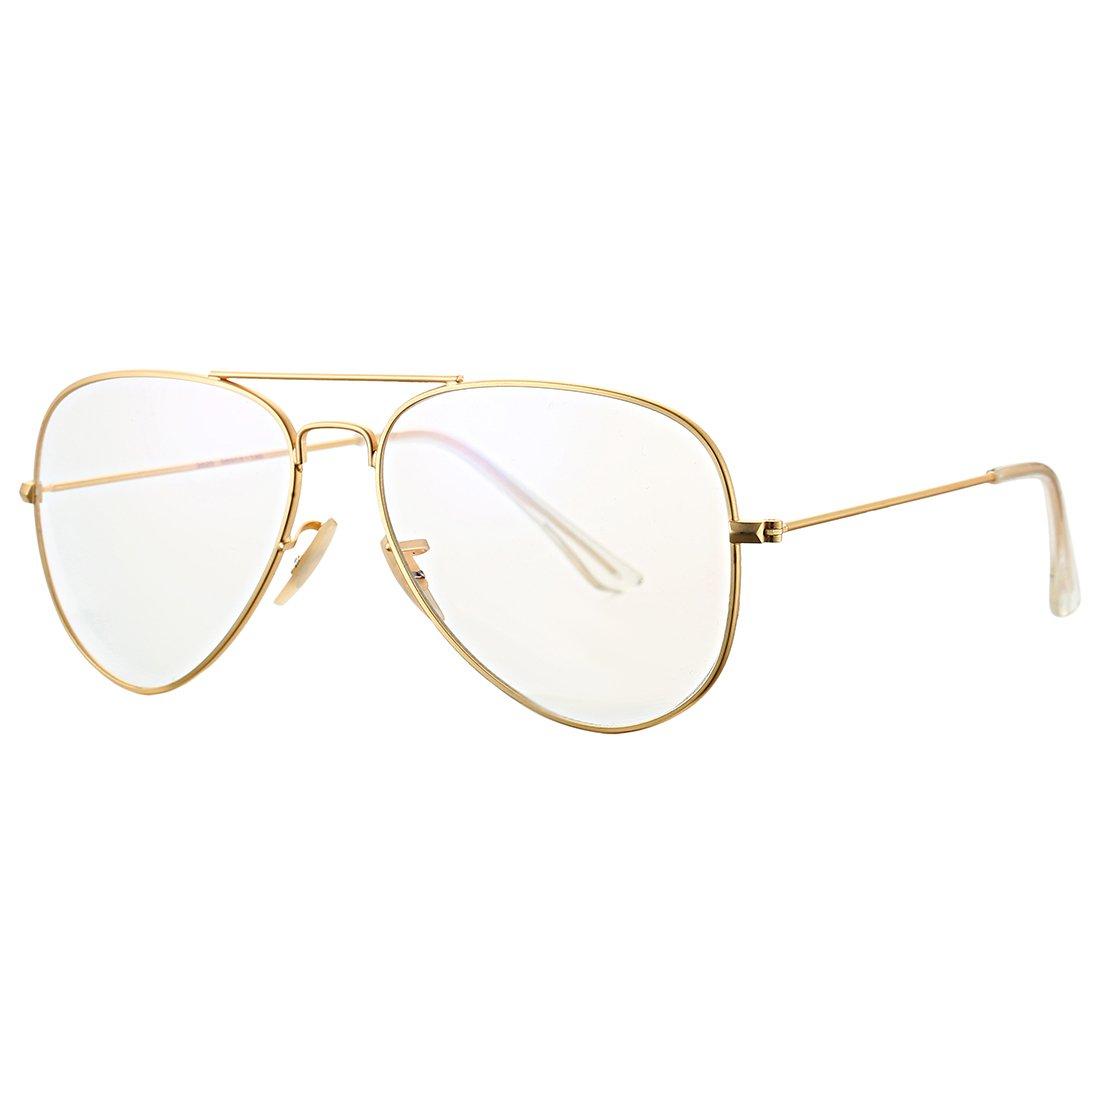 c93410c3e64 Amazon.com  COASION Classic Non prescription Aviator Glasses Clear Lens  Metal Frame Eyewear for Men Women (58mm